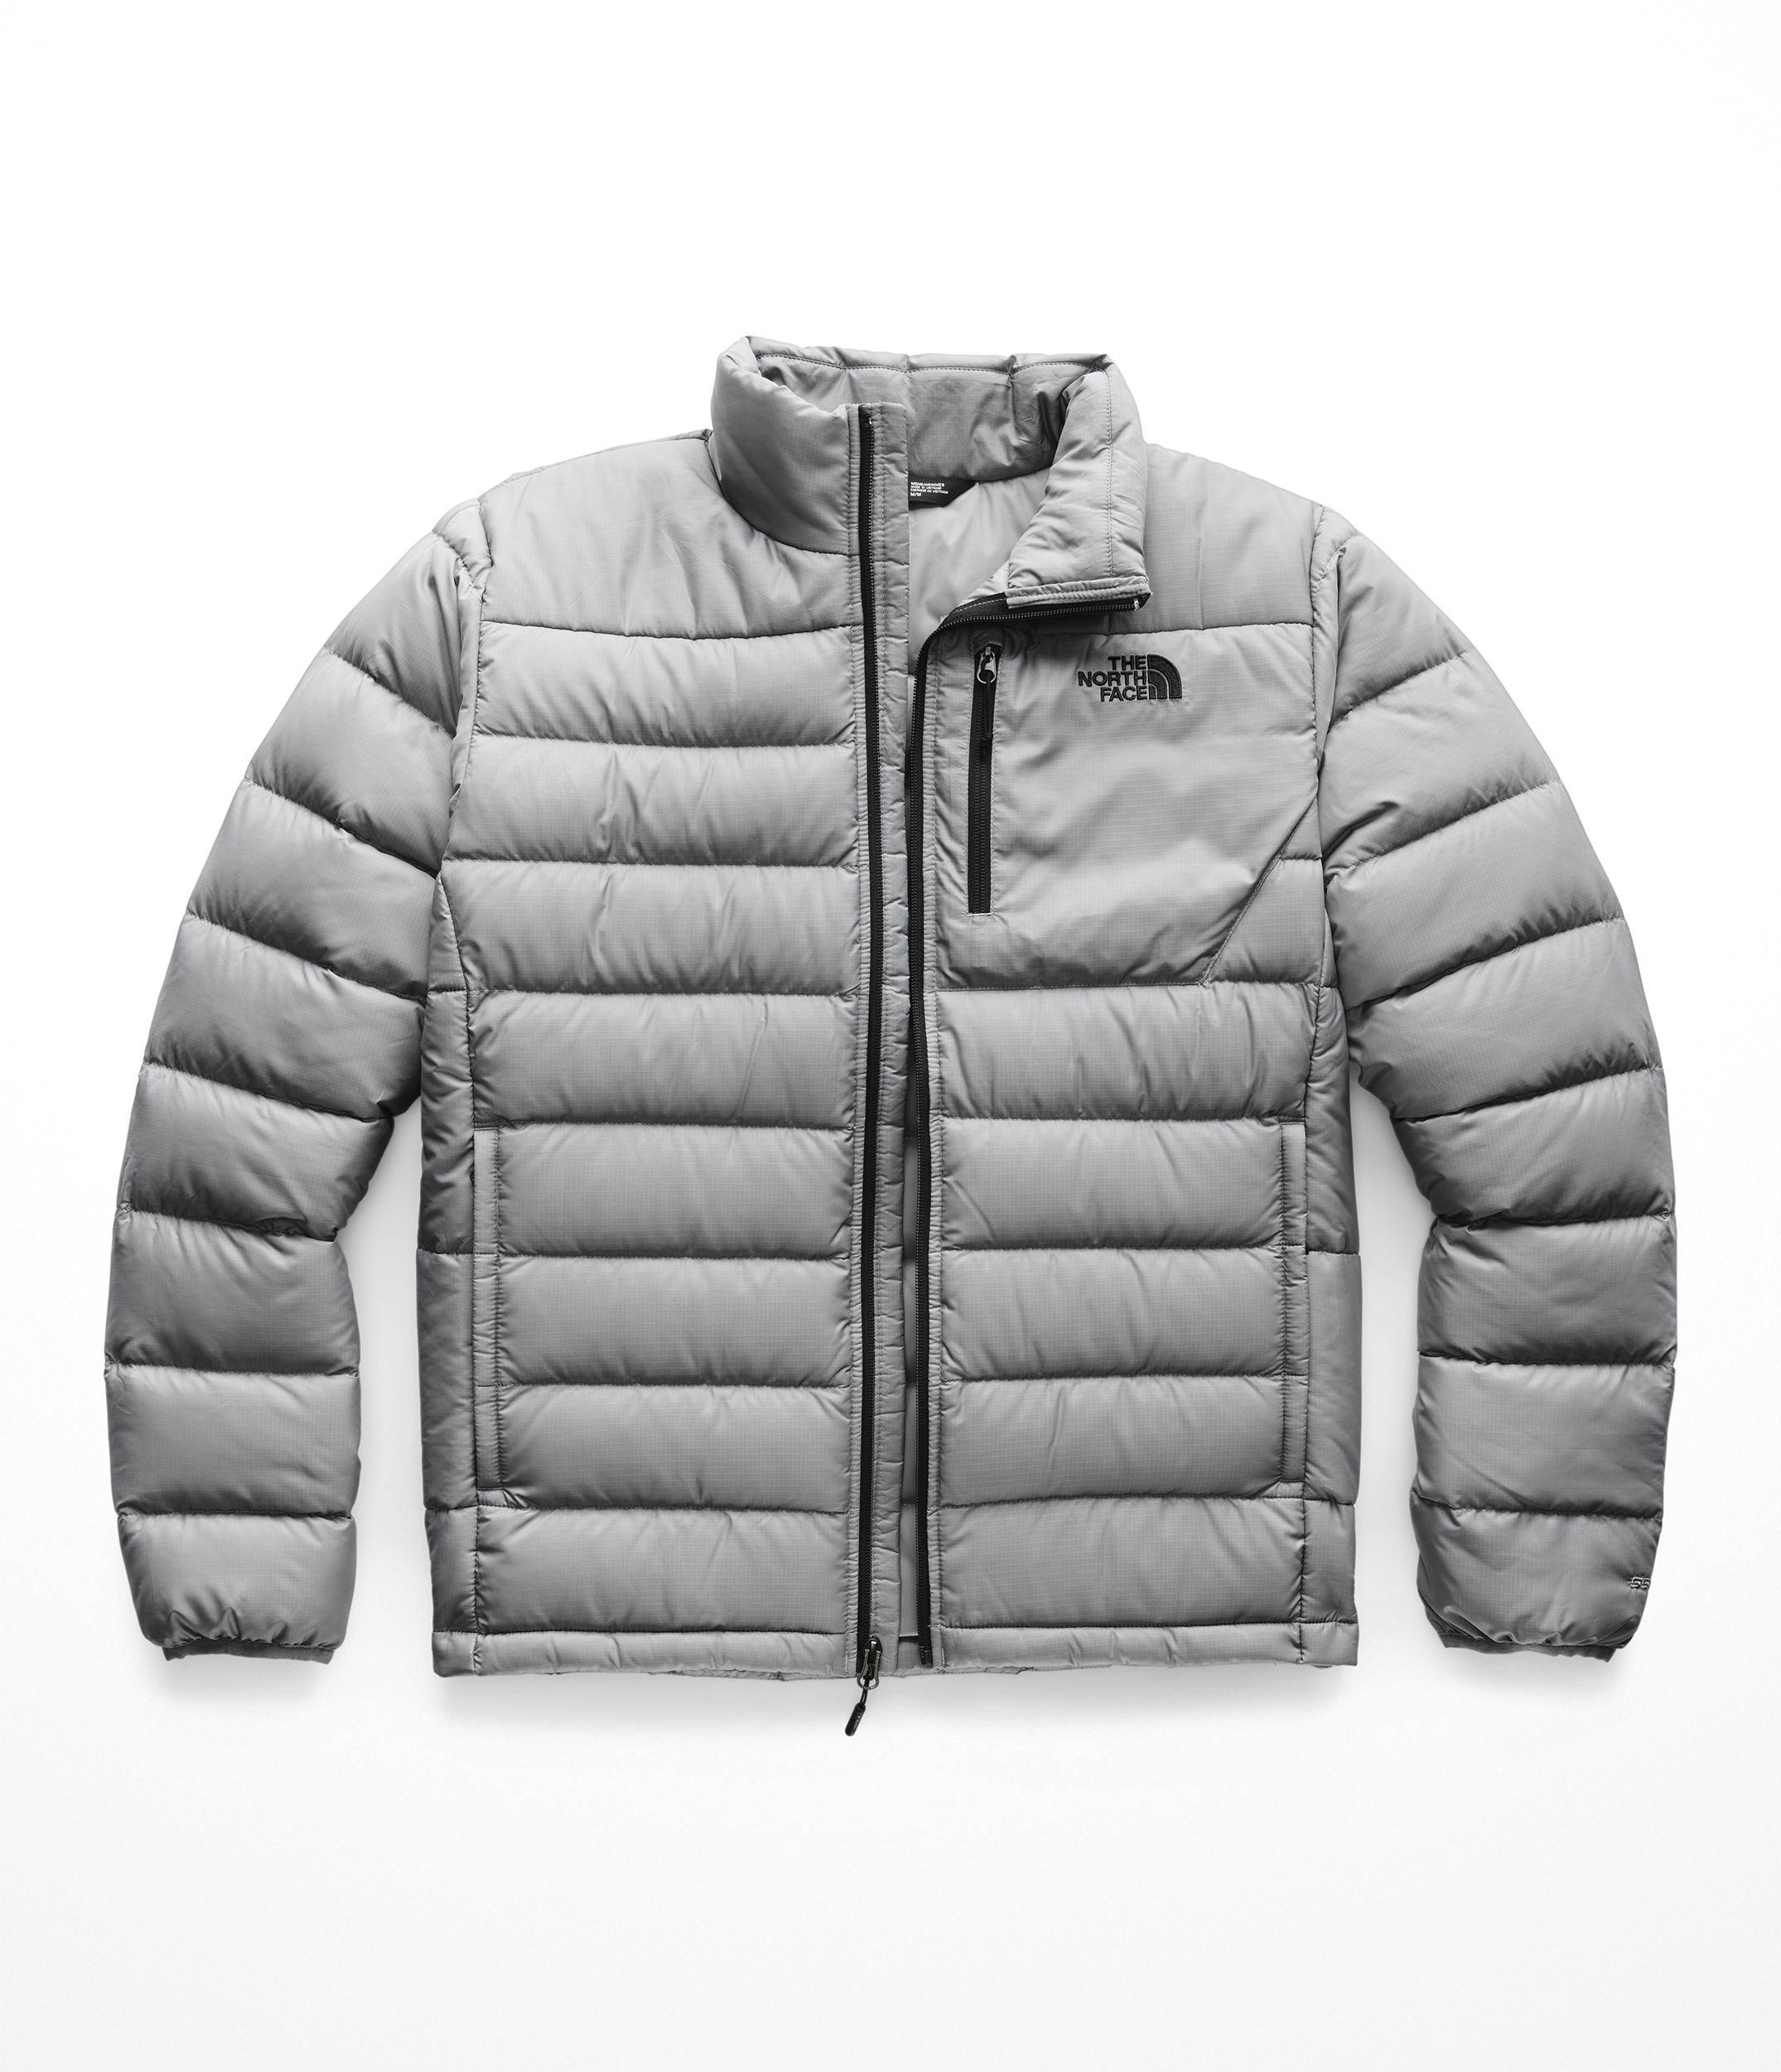 The North Face Men's Aconcagua Vest - Mid Grey - M